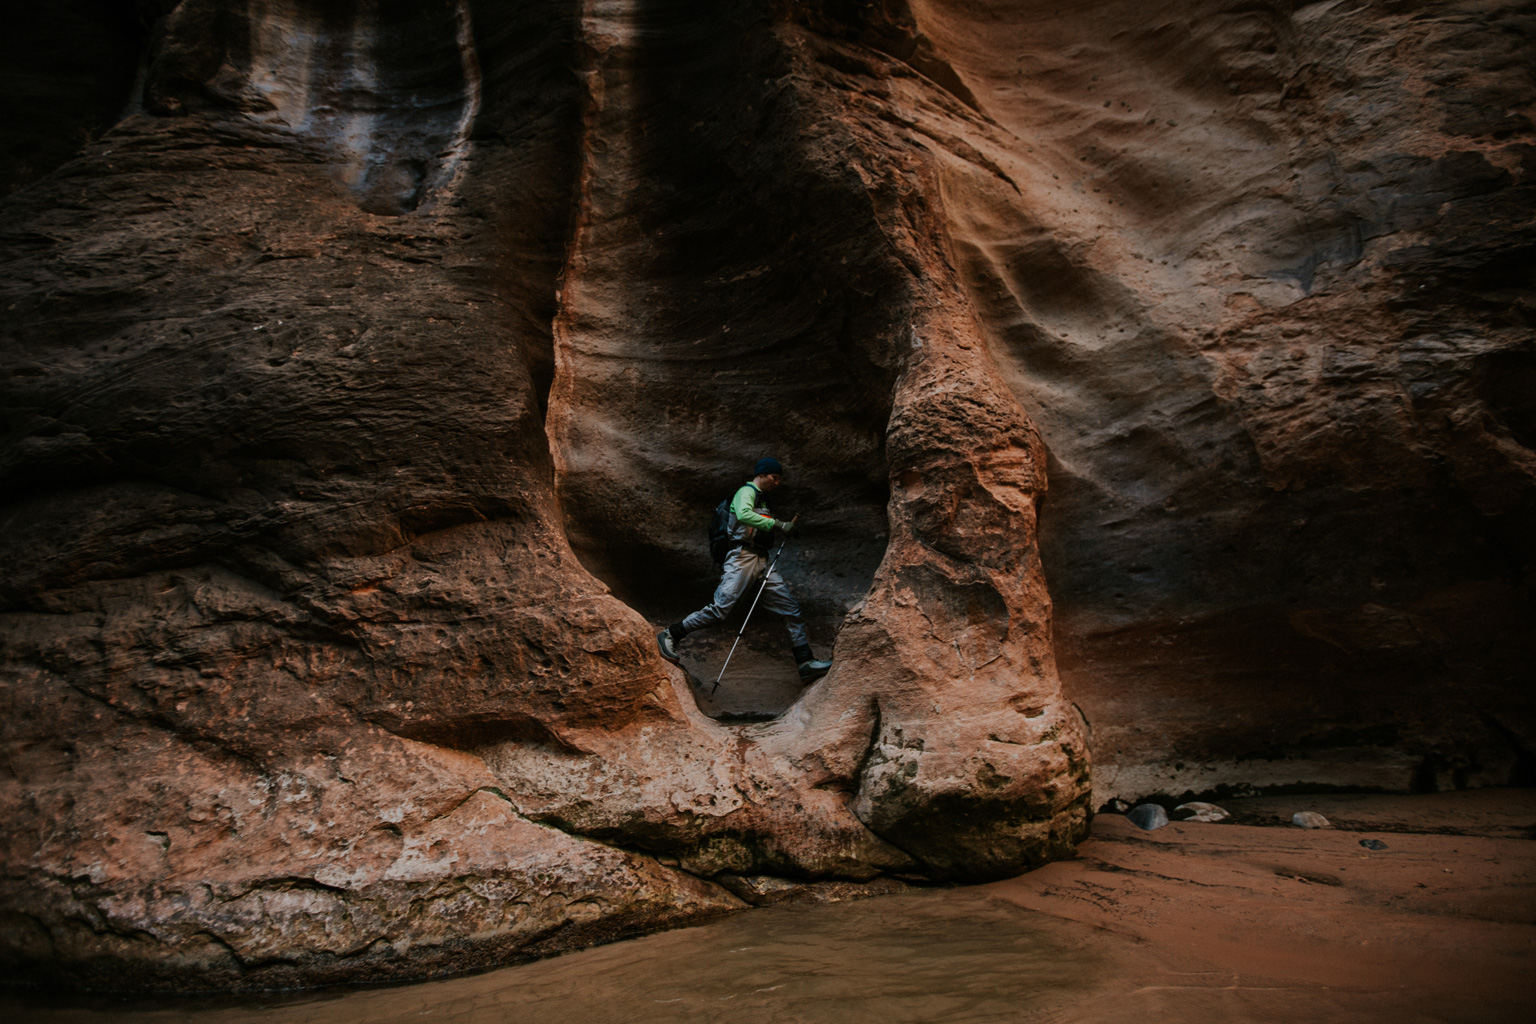 CindyGiovagnoli_Zion_National_Park_Utah_Narrows_hike_winter-008.jpg